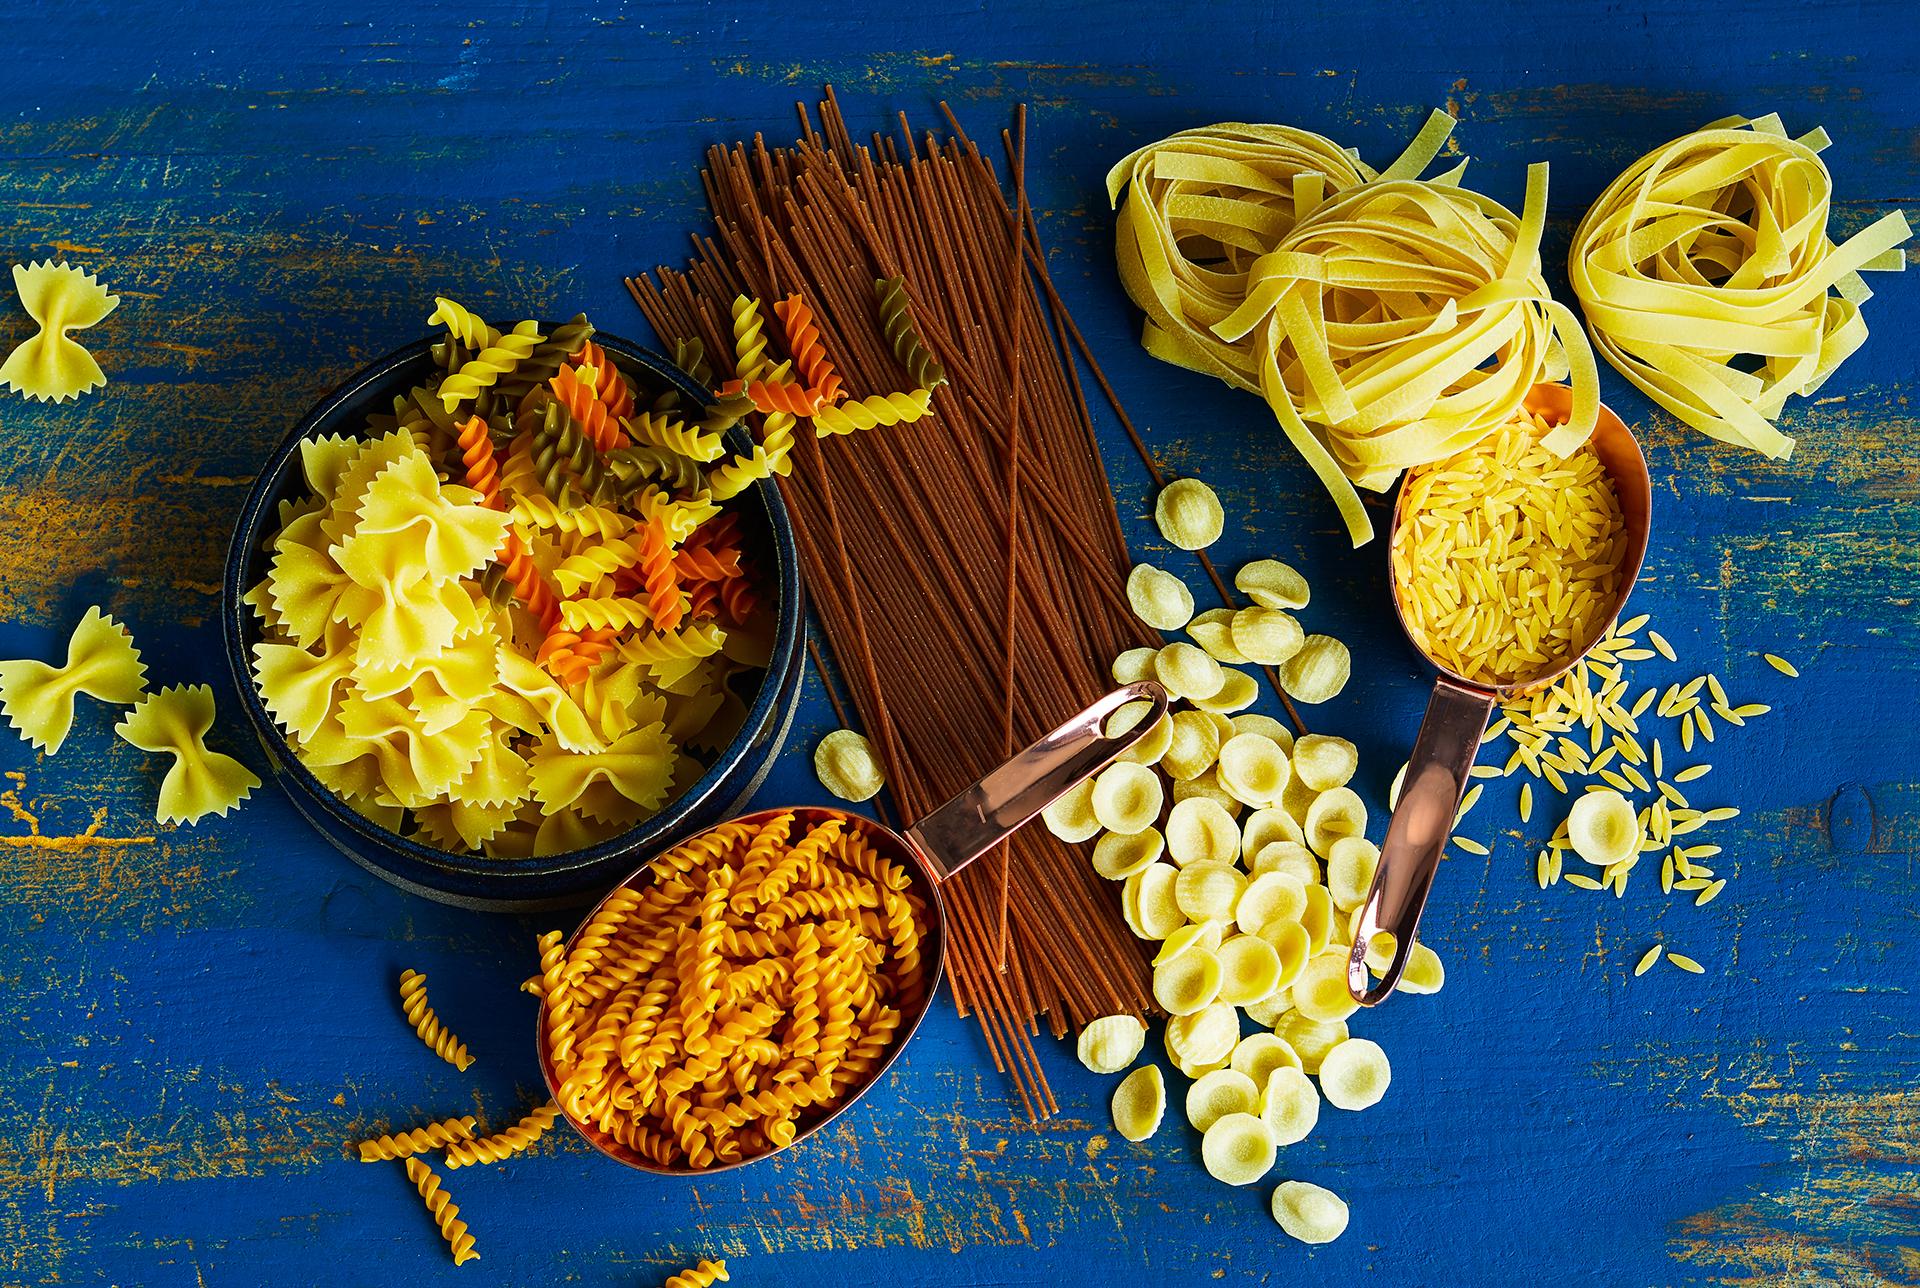 verschiedene Nudelsorten auf dunkelblauen Holzbrett. Farfalle, Spirelli, Spaghetti, Tagliatelle, Kritharaki, Orecchiette, Kichererbsennudeln, Linsennudeln fotografiert von Katrin Winner